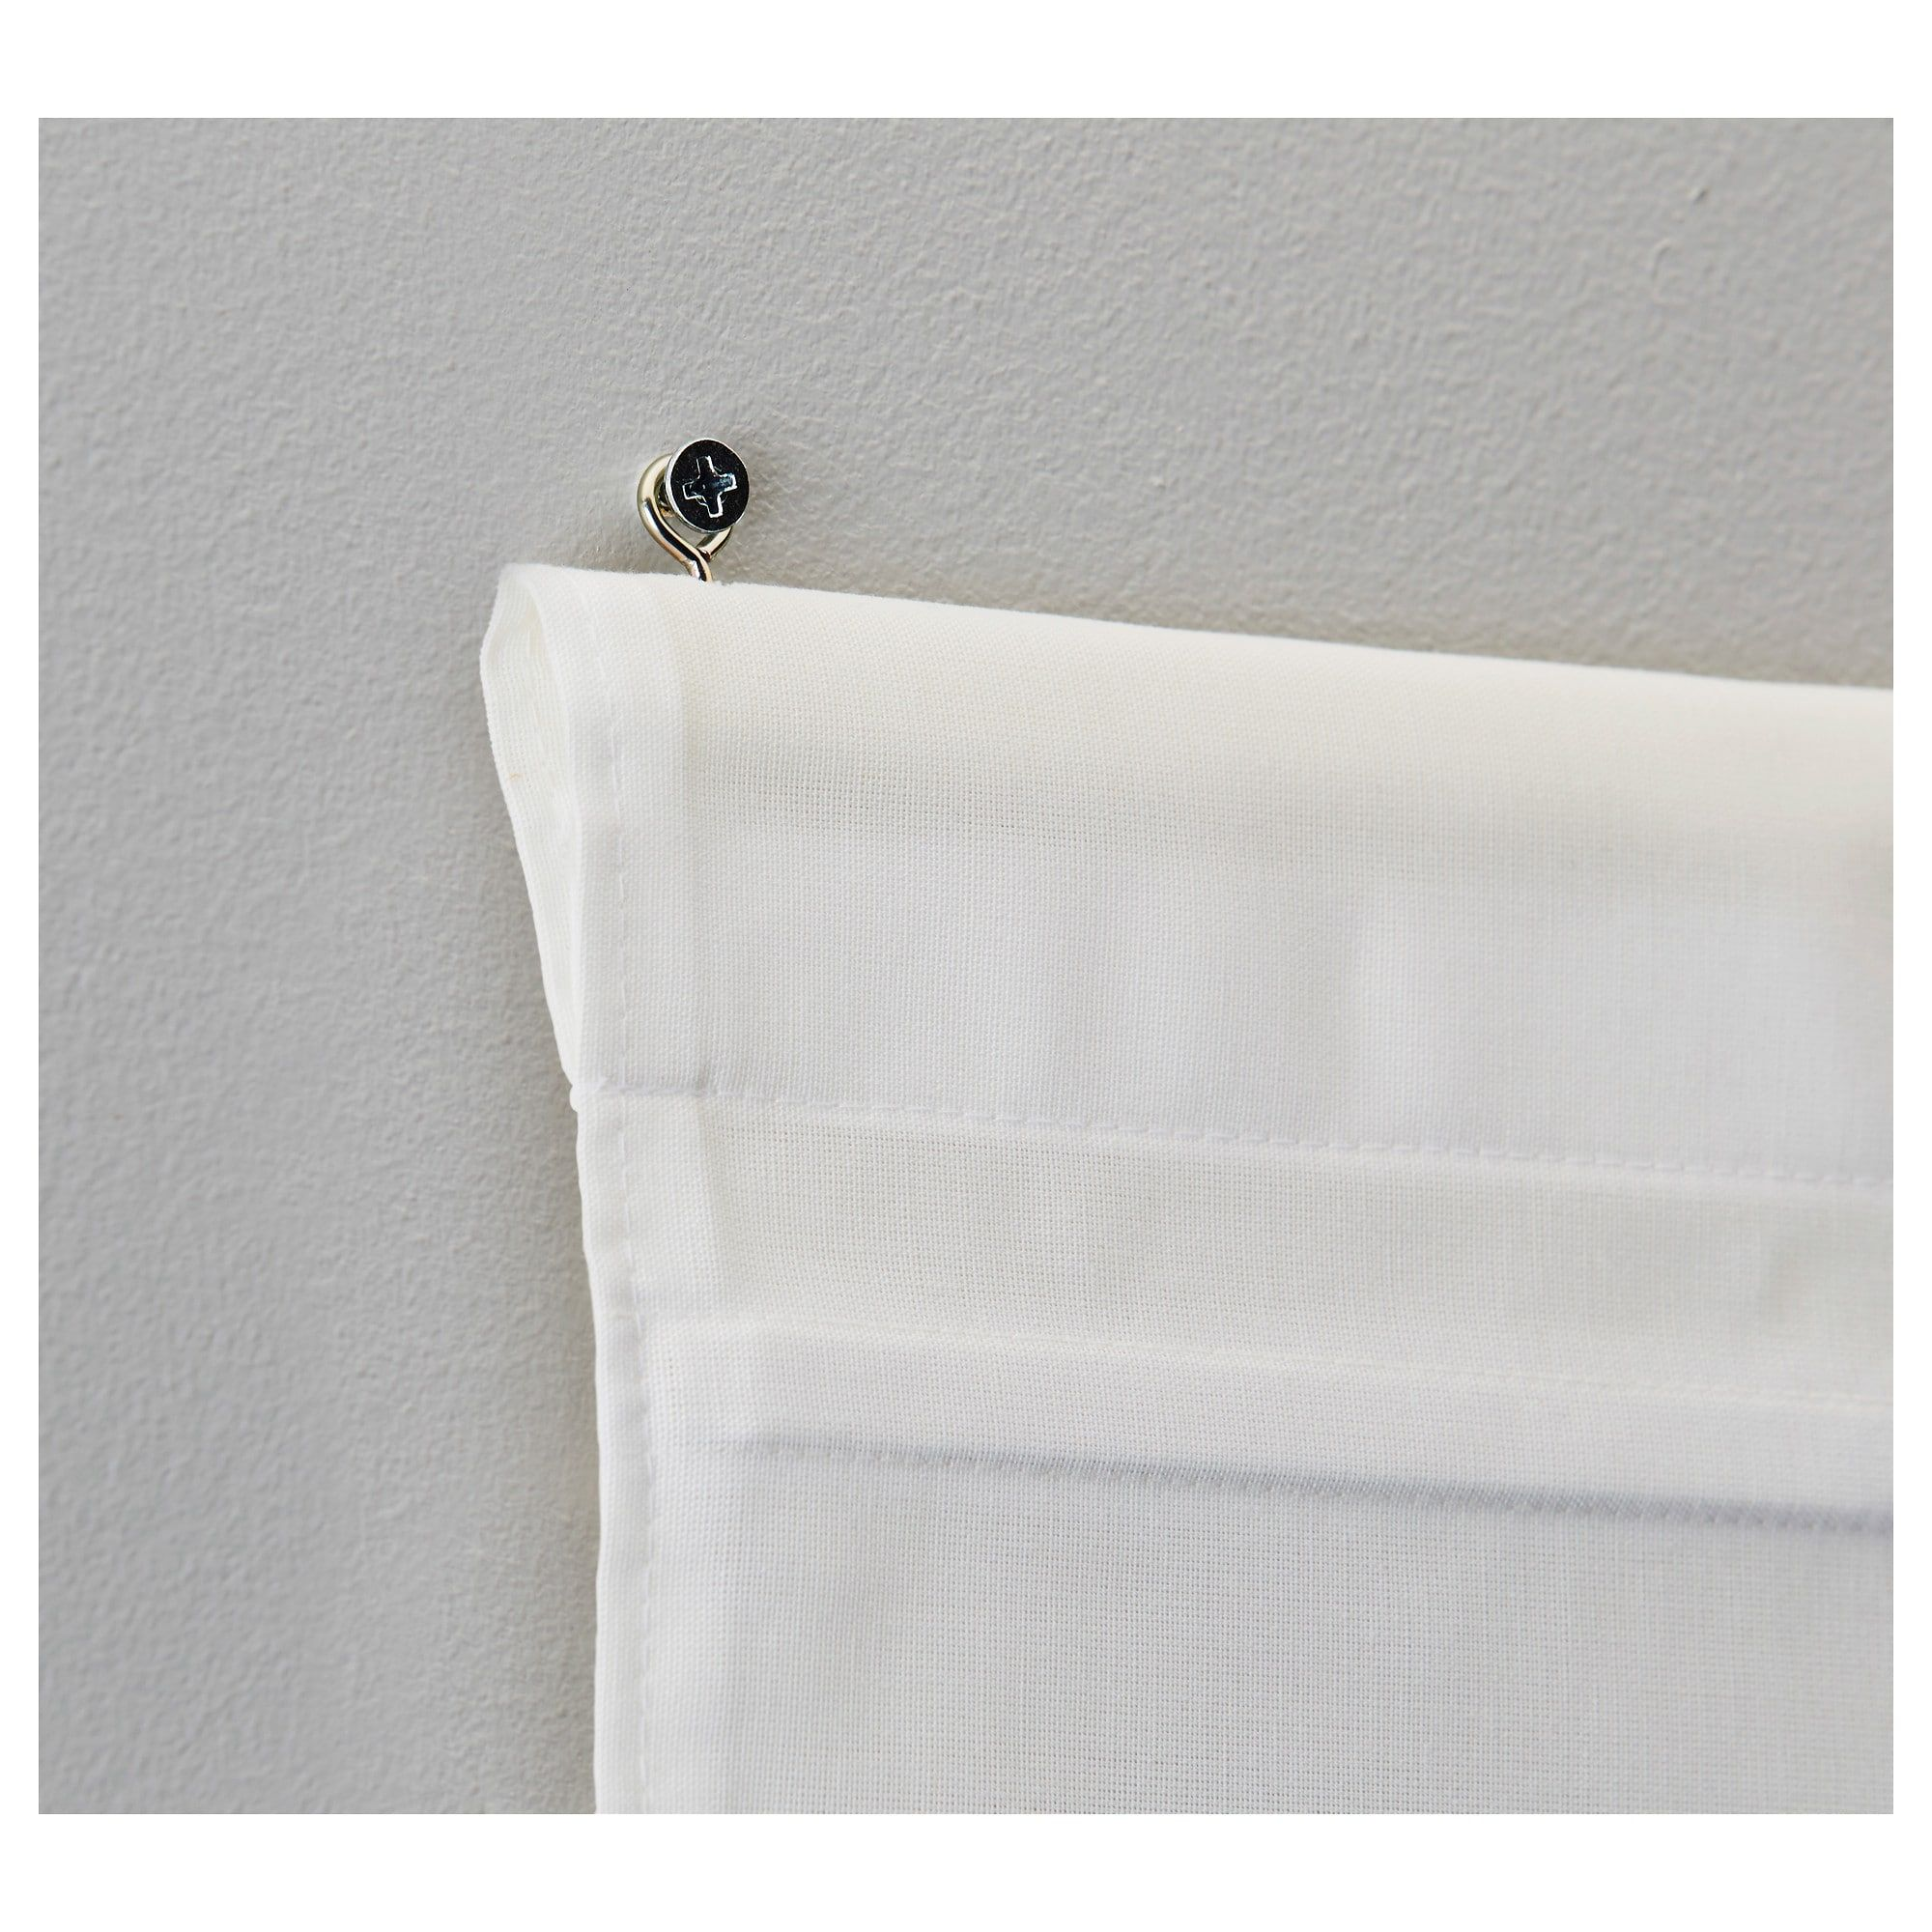 Store Bateau Blanc Ikea ikea - ringblomma roman blind white | blind, rideaux